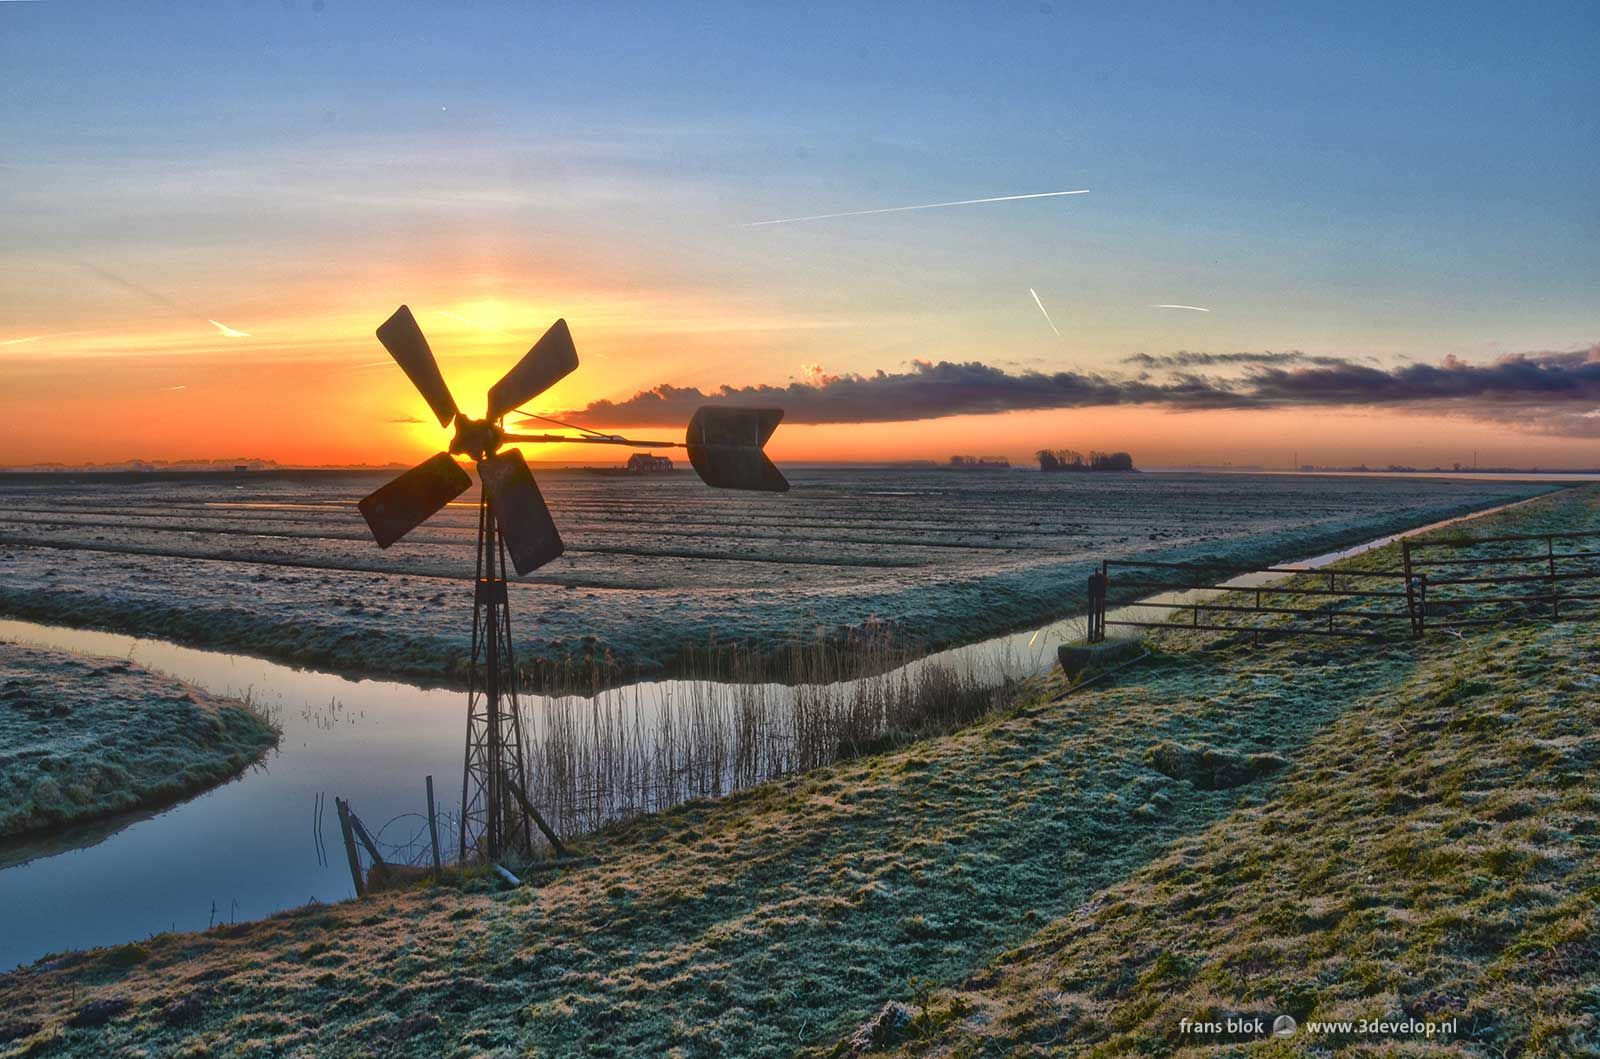 De Korendijkse Slikken op Paasochtend 2015: zonsopkomst en een oude windmolen,